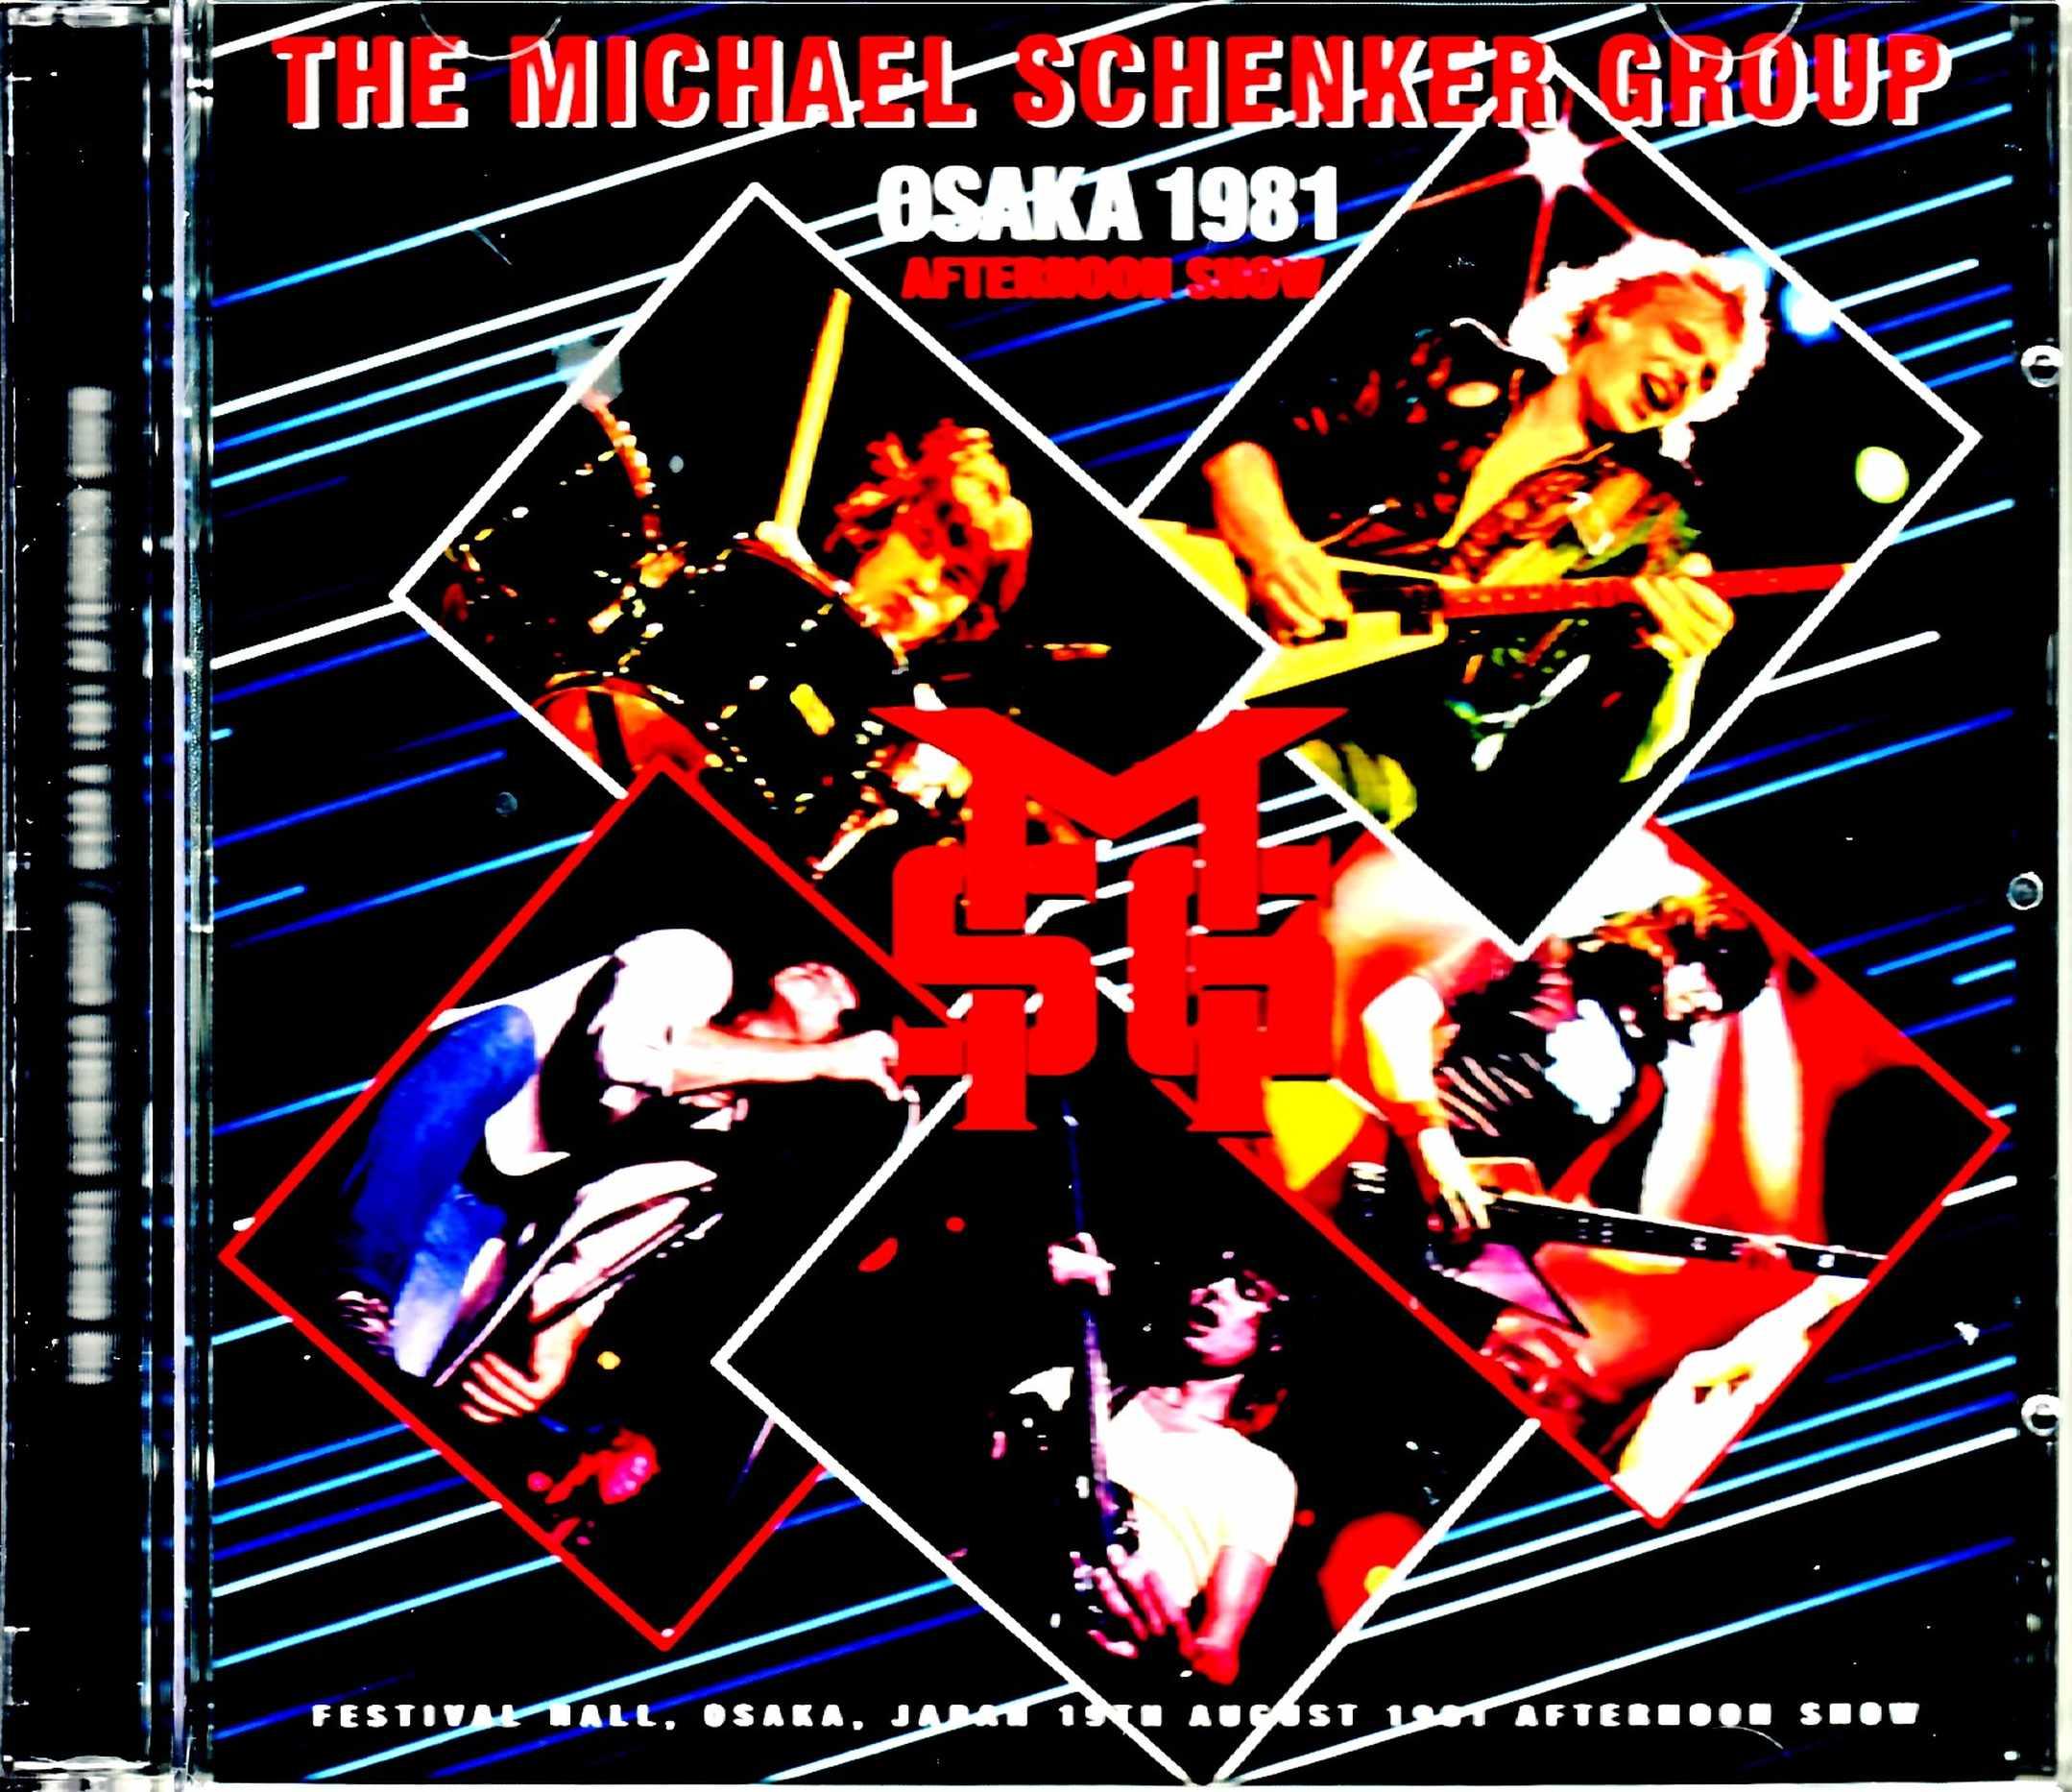 Michael Schenker Group マイケル・シェンカー/Osaka,Japan 1981 Afternoon Show